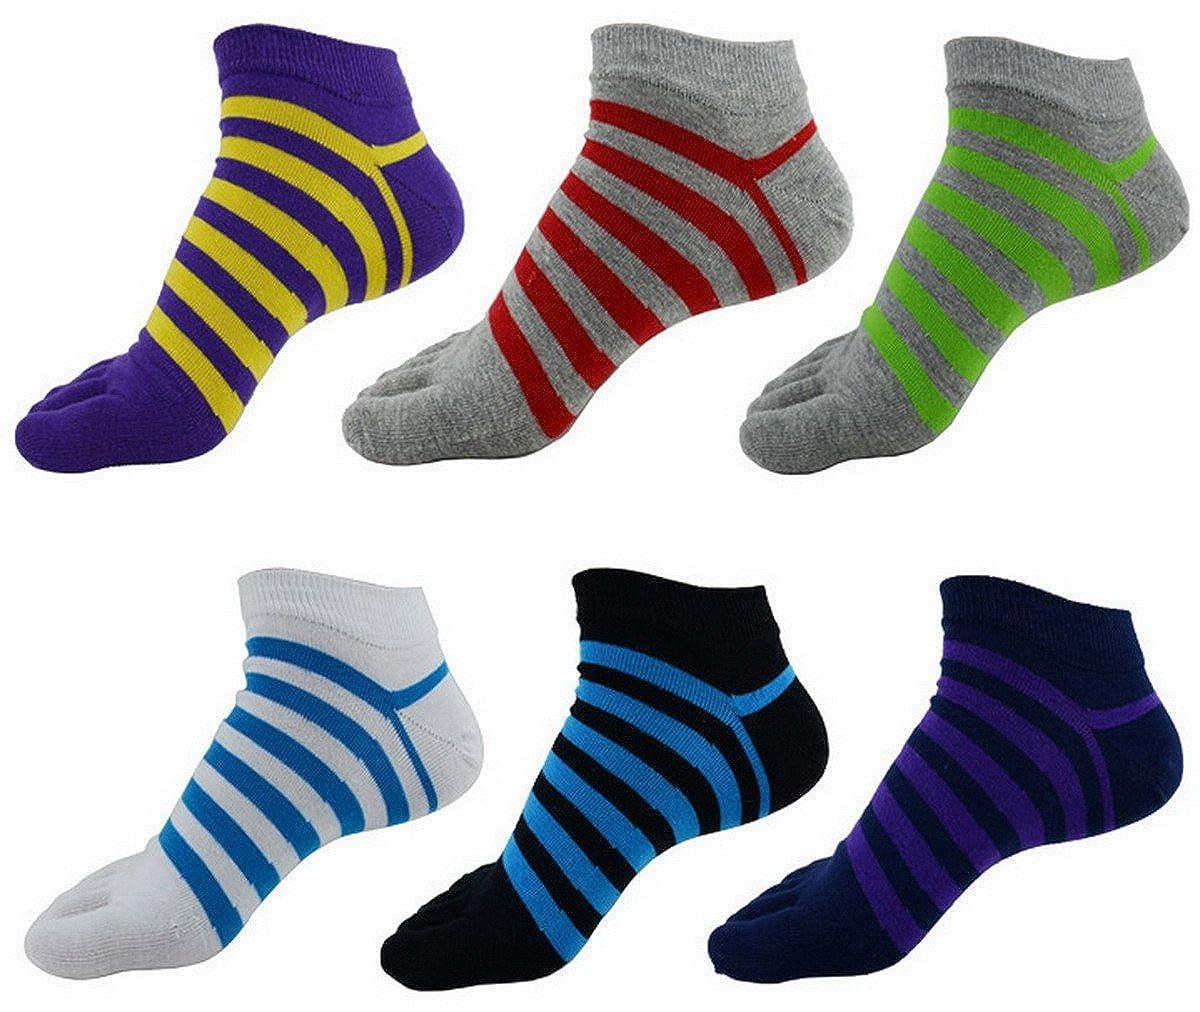 Men Boys Cotton Five Fingers Colorful Striped Separate Toe Yoga Pilates Socks 6 Pairs AHA